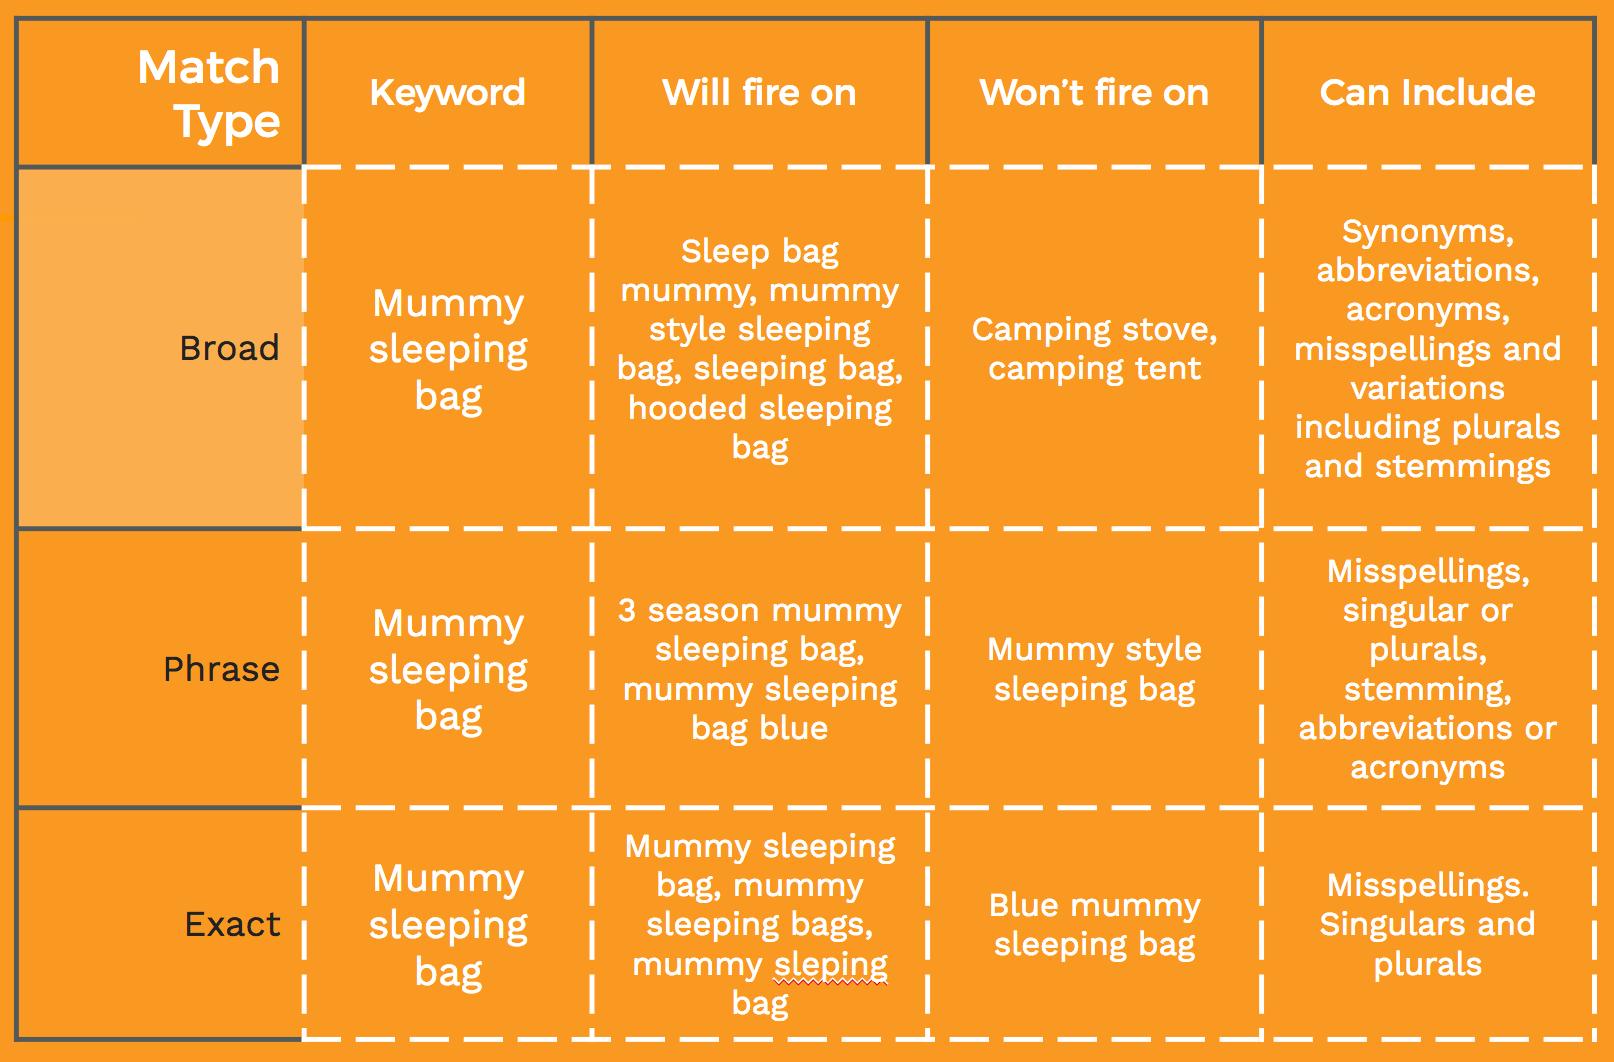 Amazon match types example chart